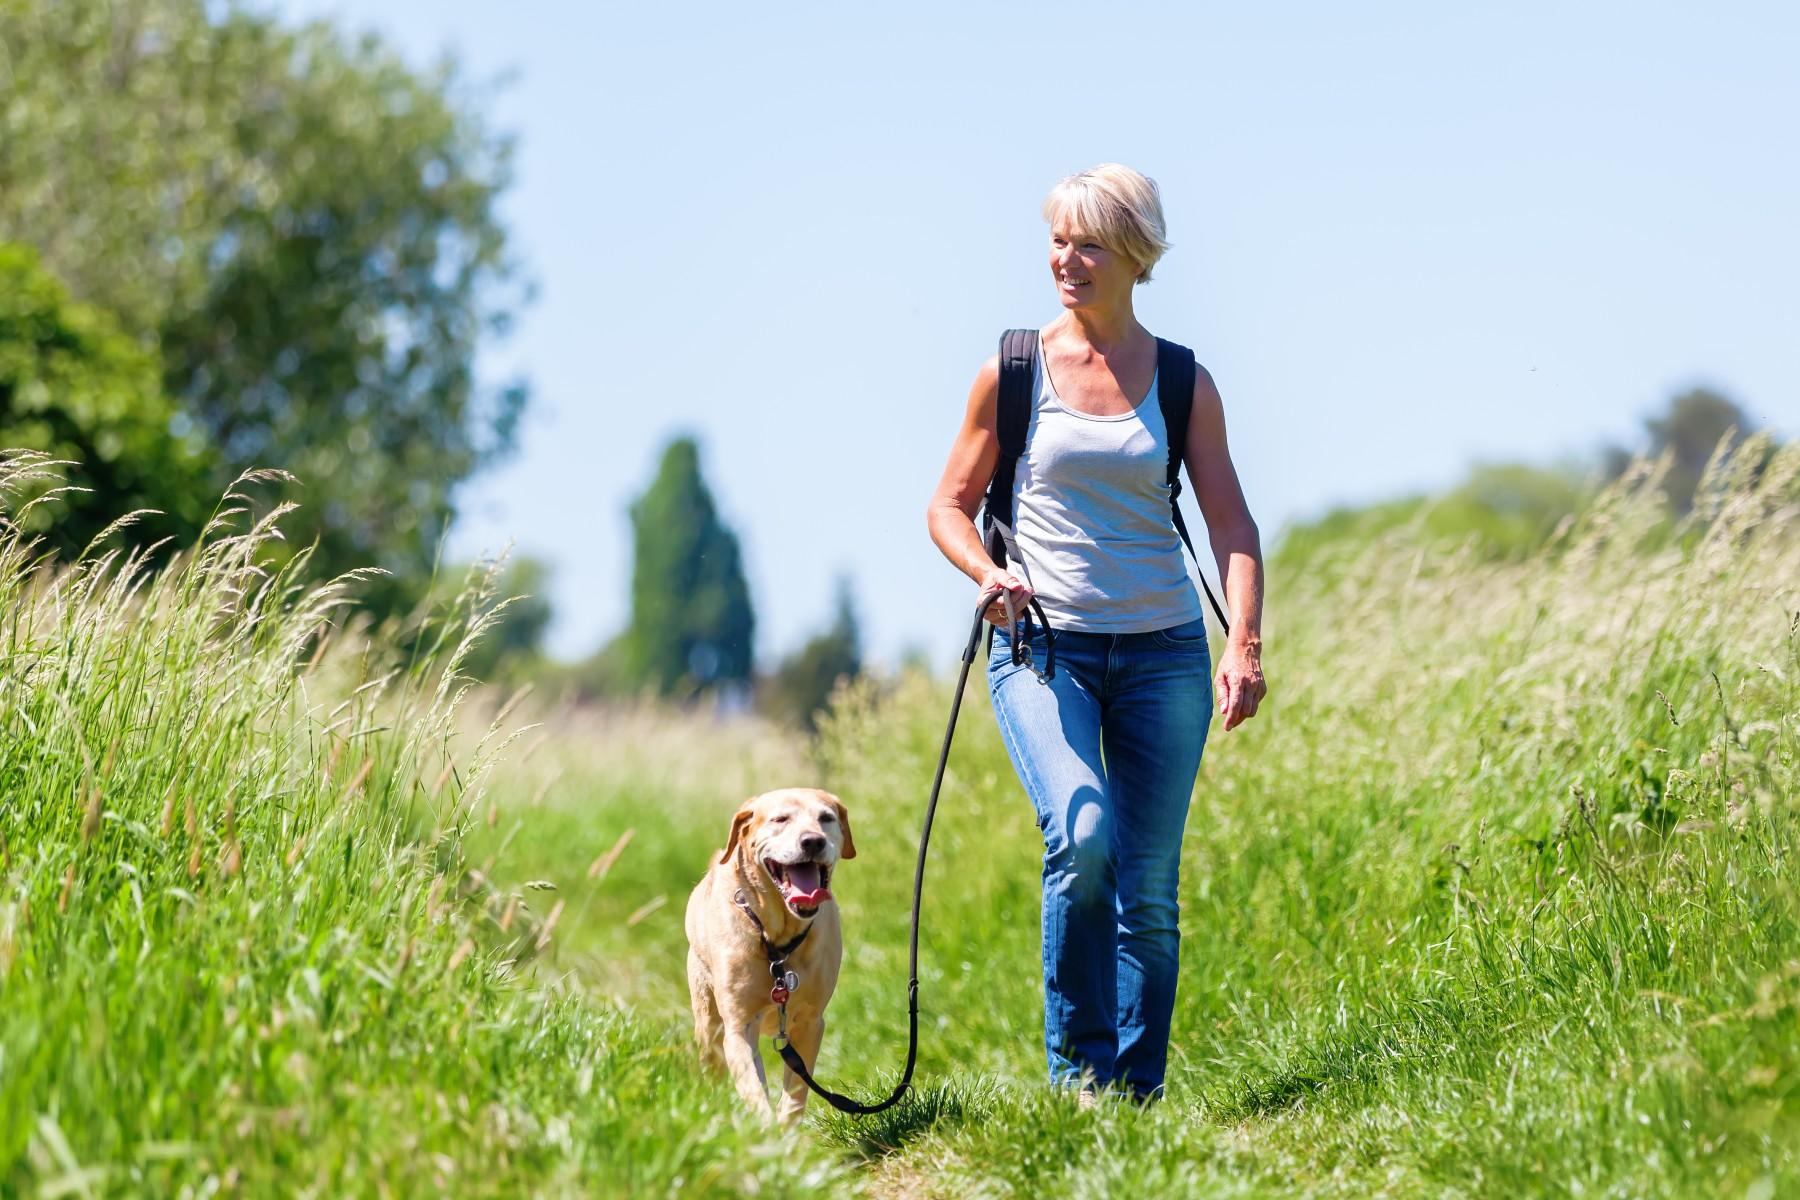 Swiss woman dog walking